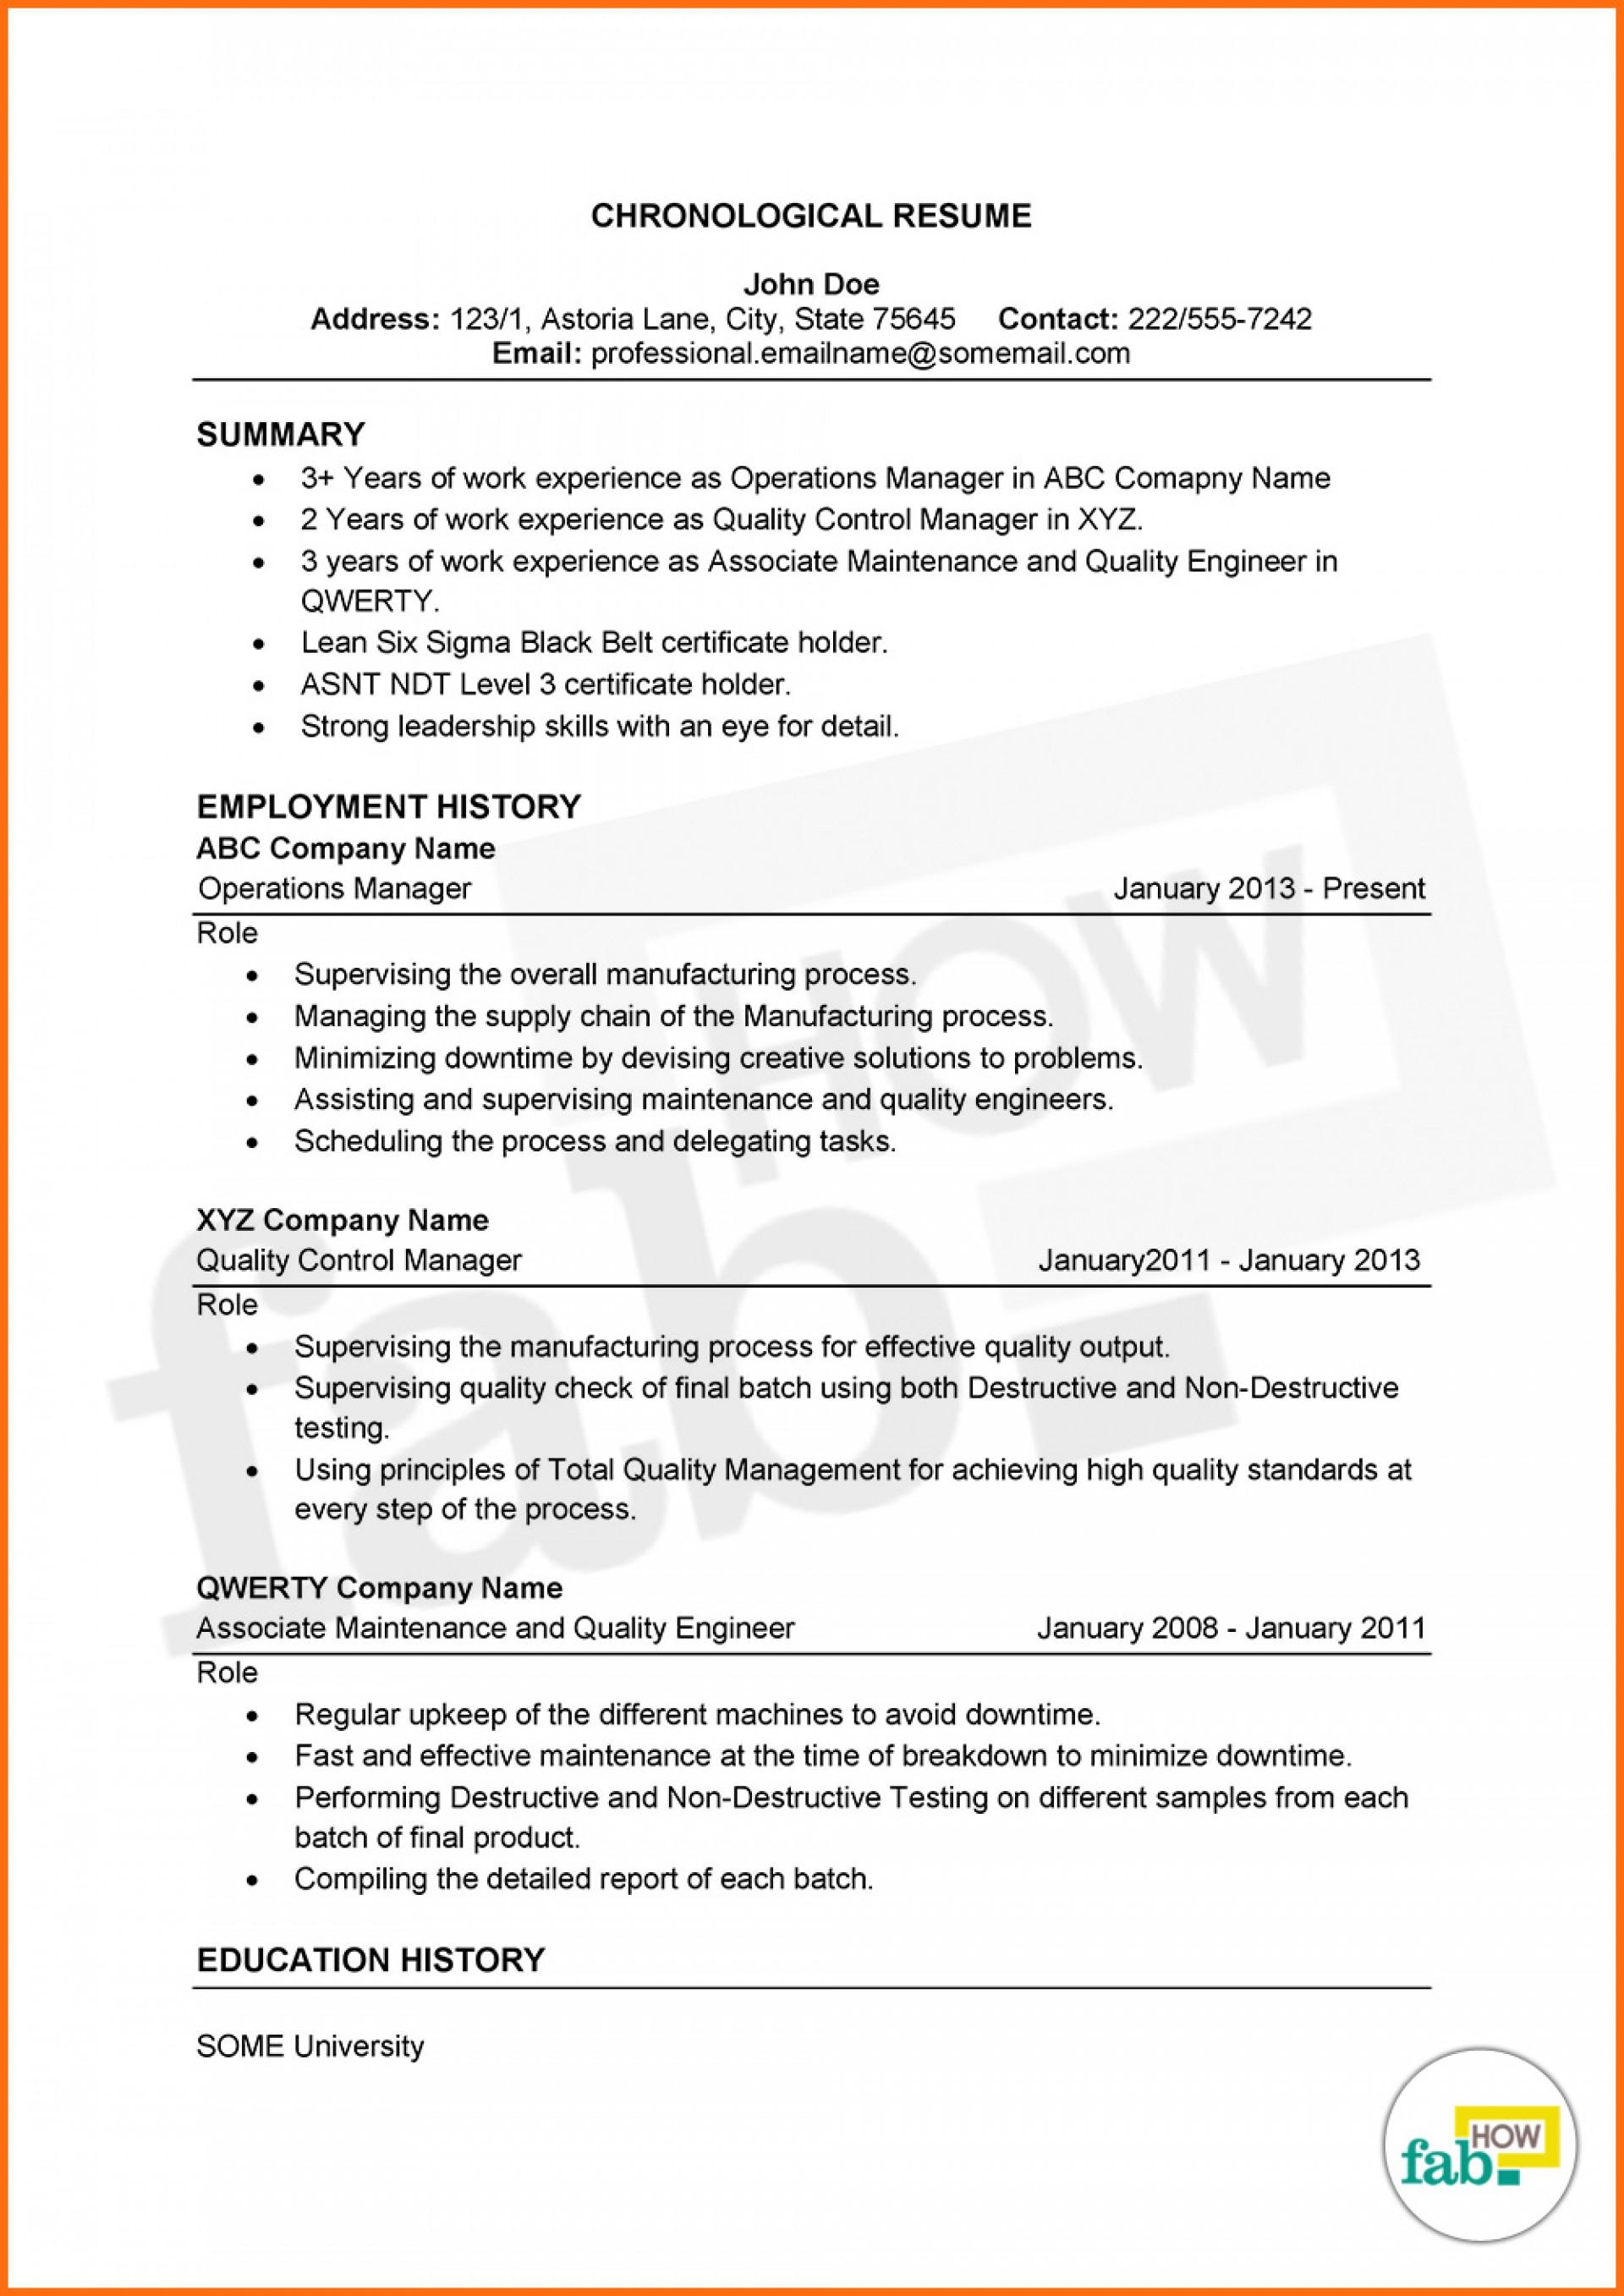 013 3401629181 Custom College Essays Essay Excellent Writing Service 1920